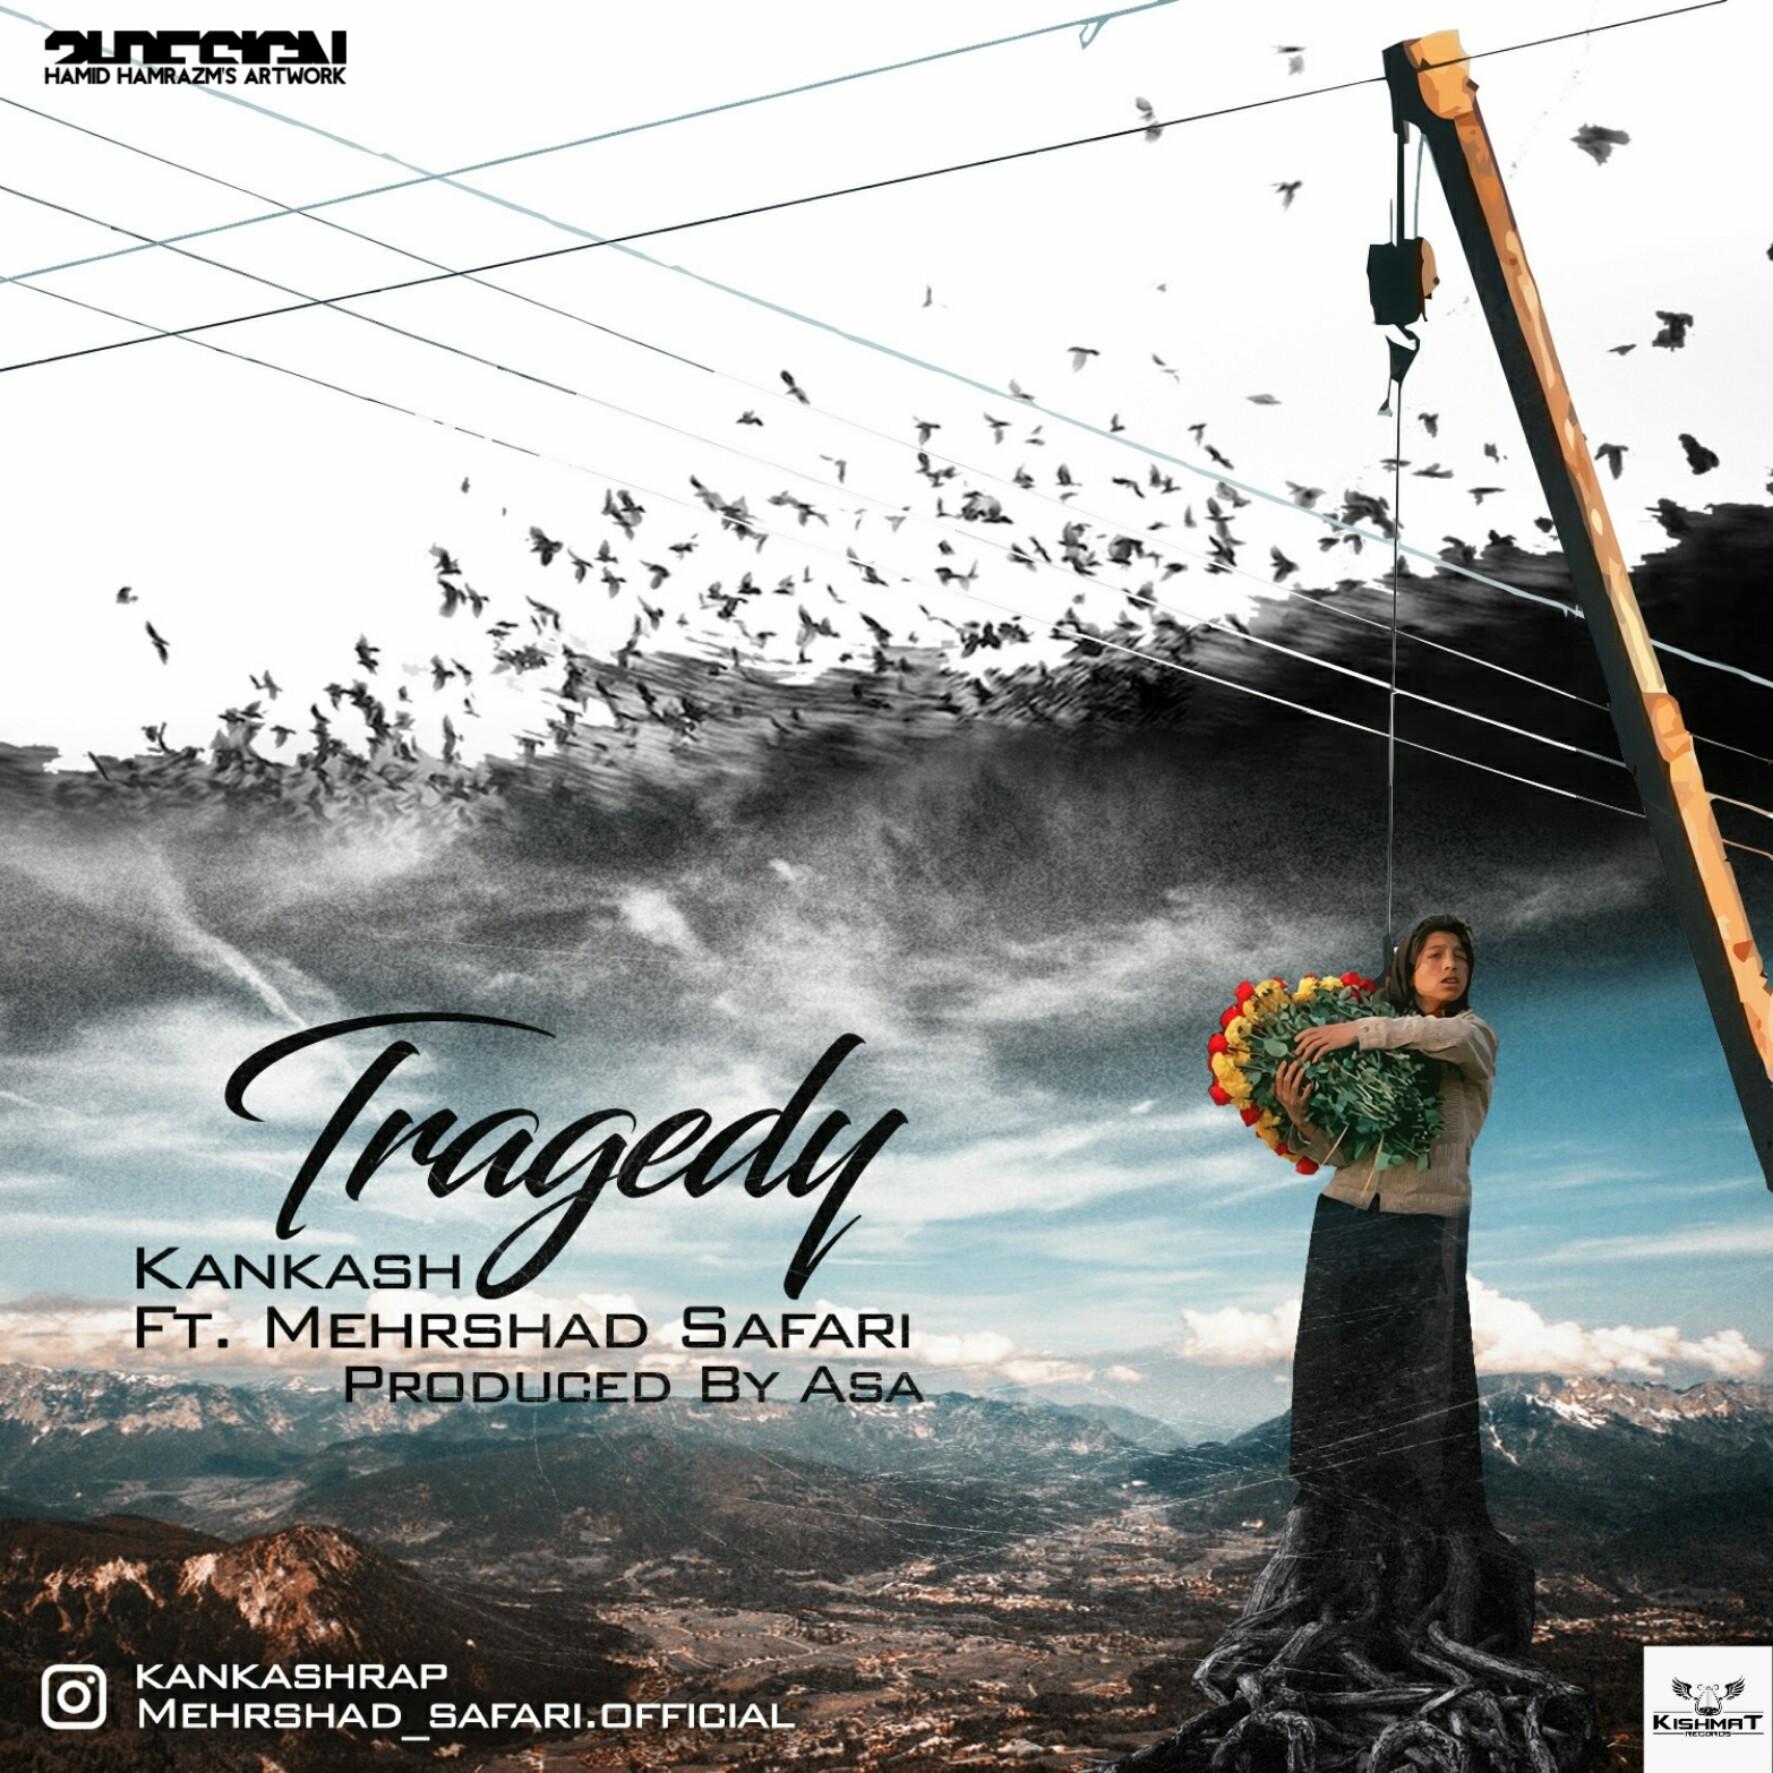 Teragedy